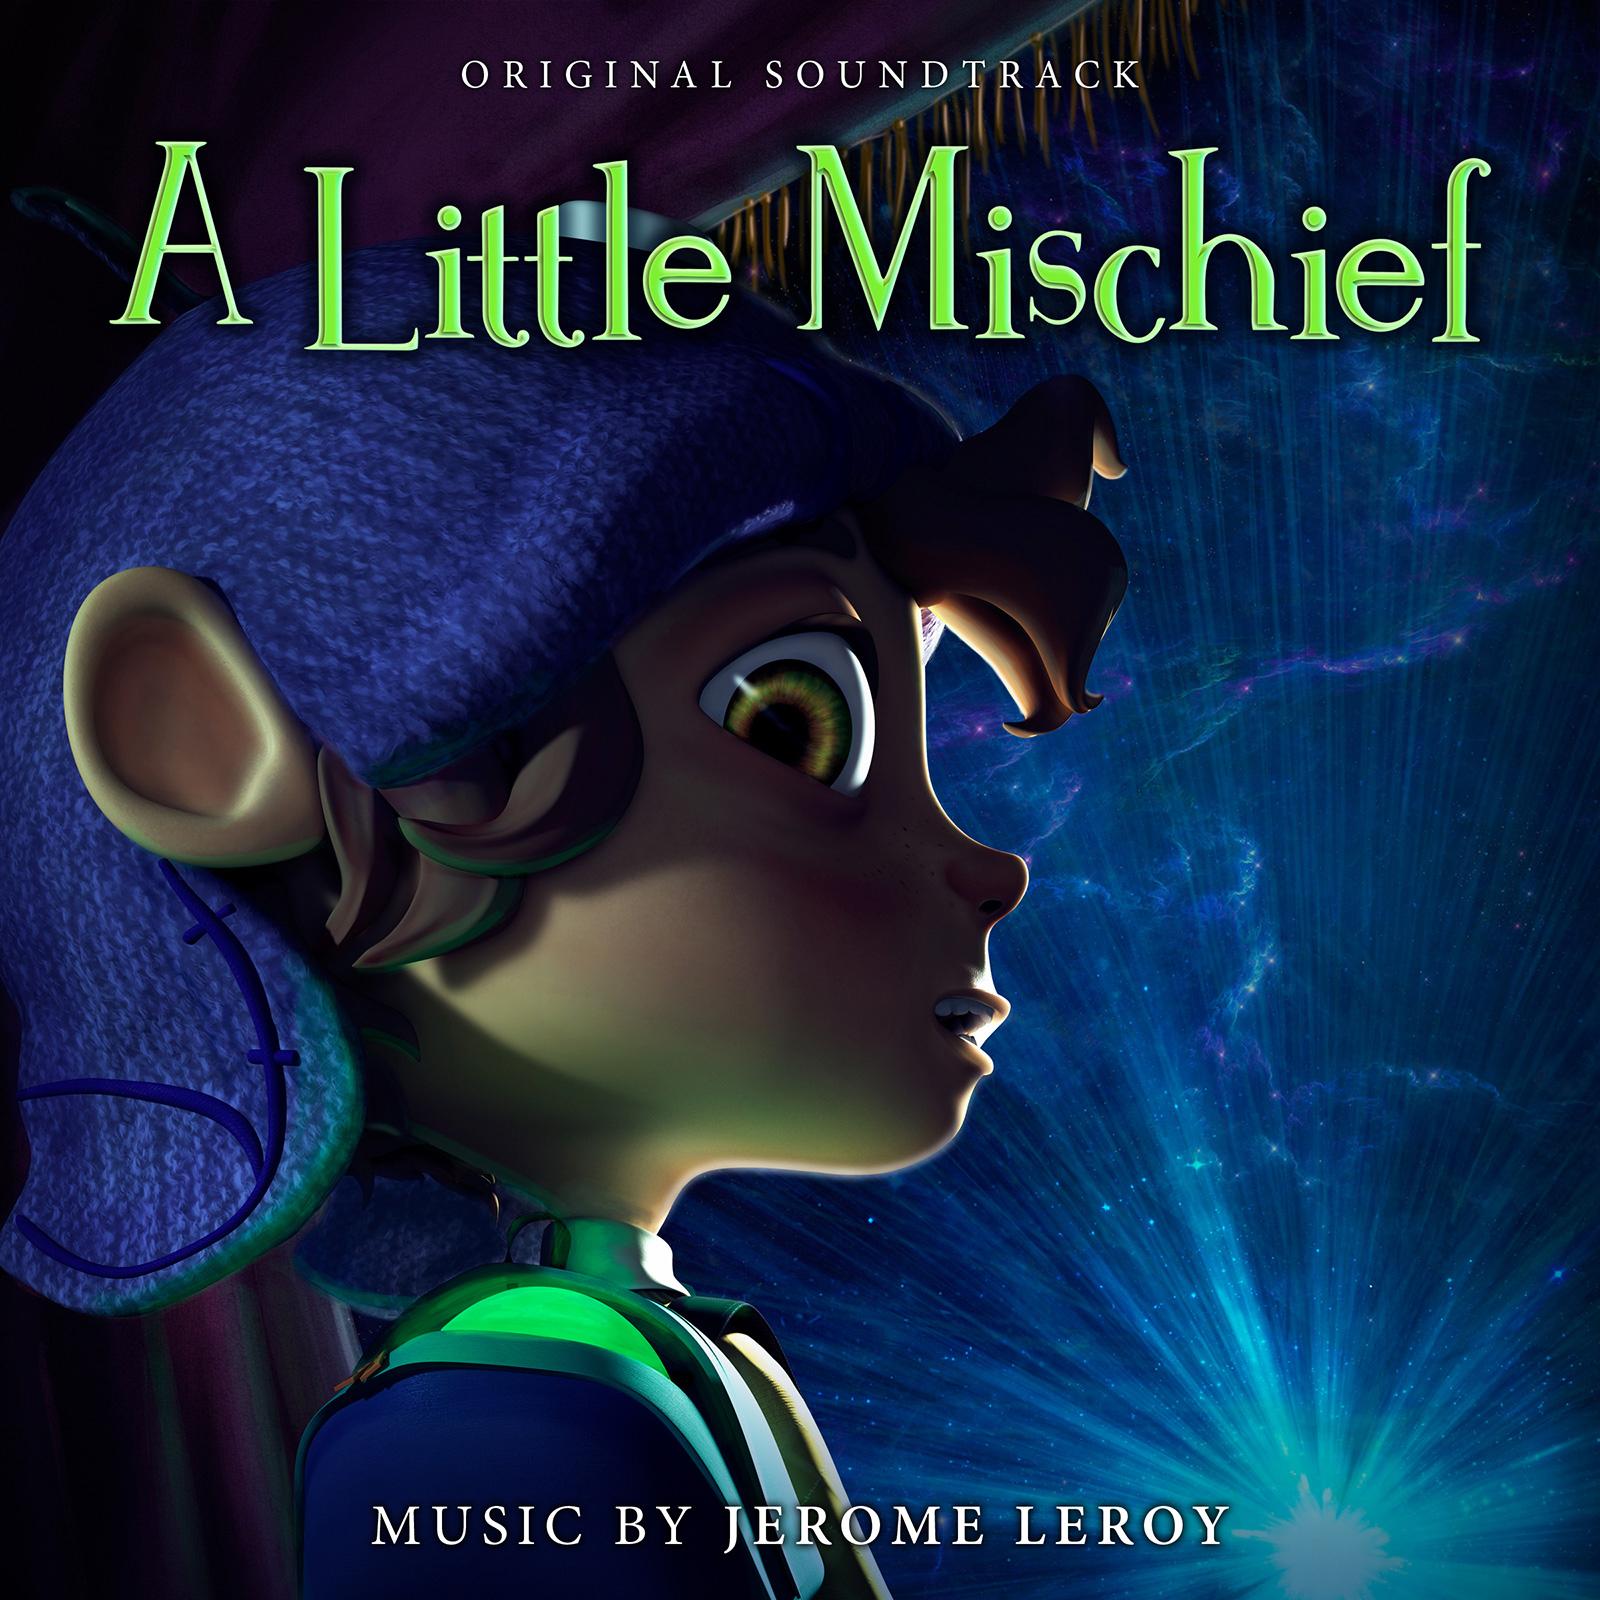 A Little Mischief – Original Soundtrack (Cover Art) 1600px.jpg